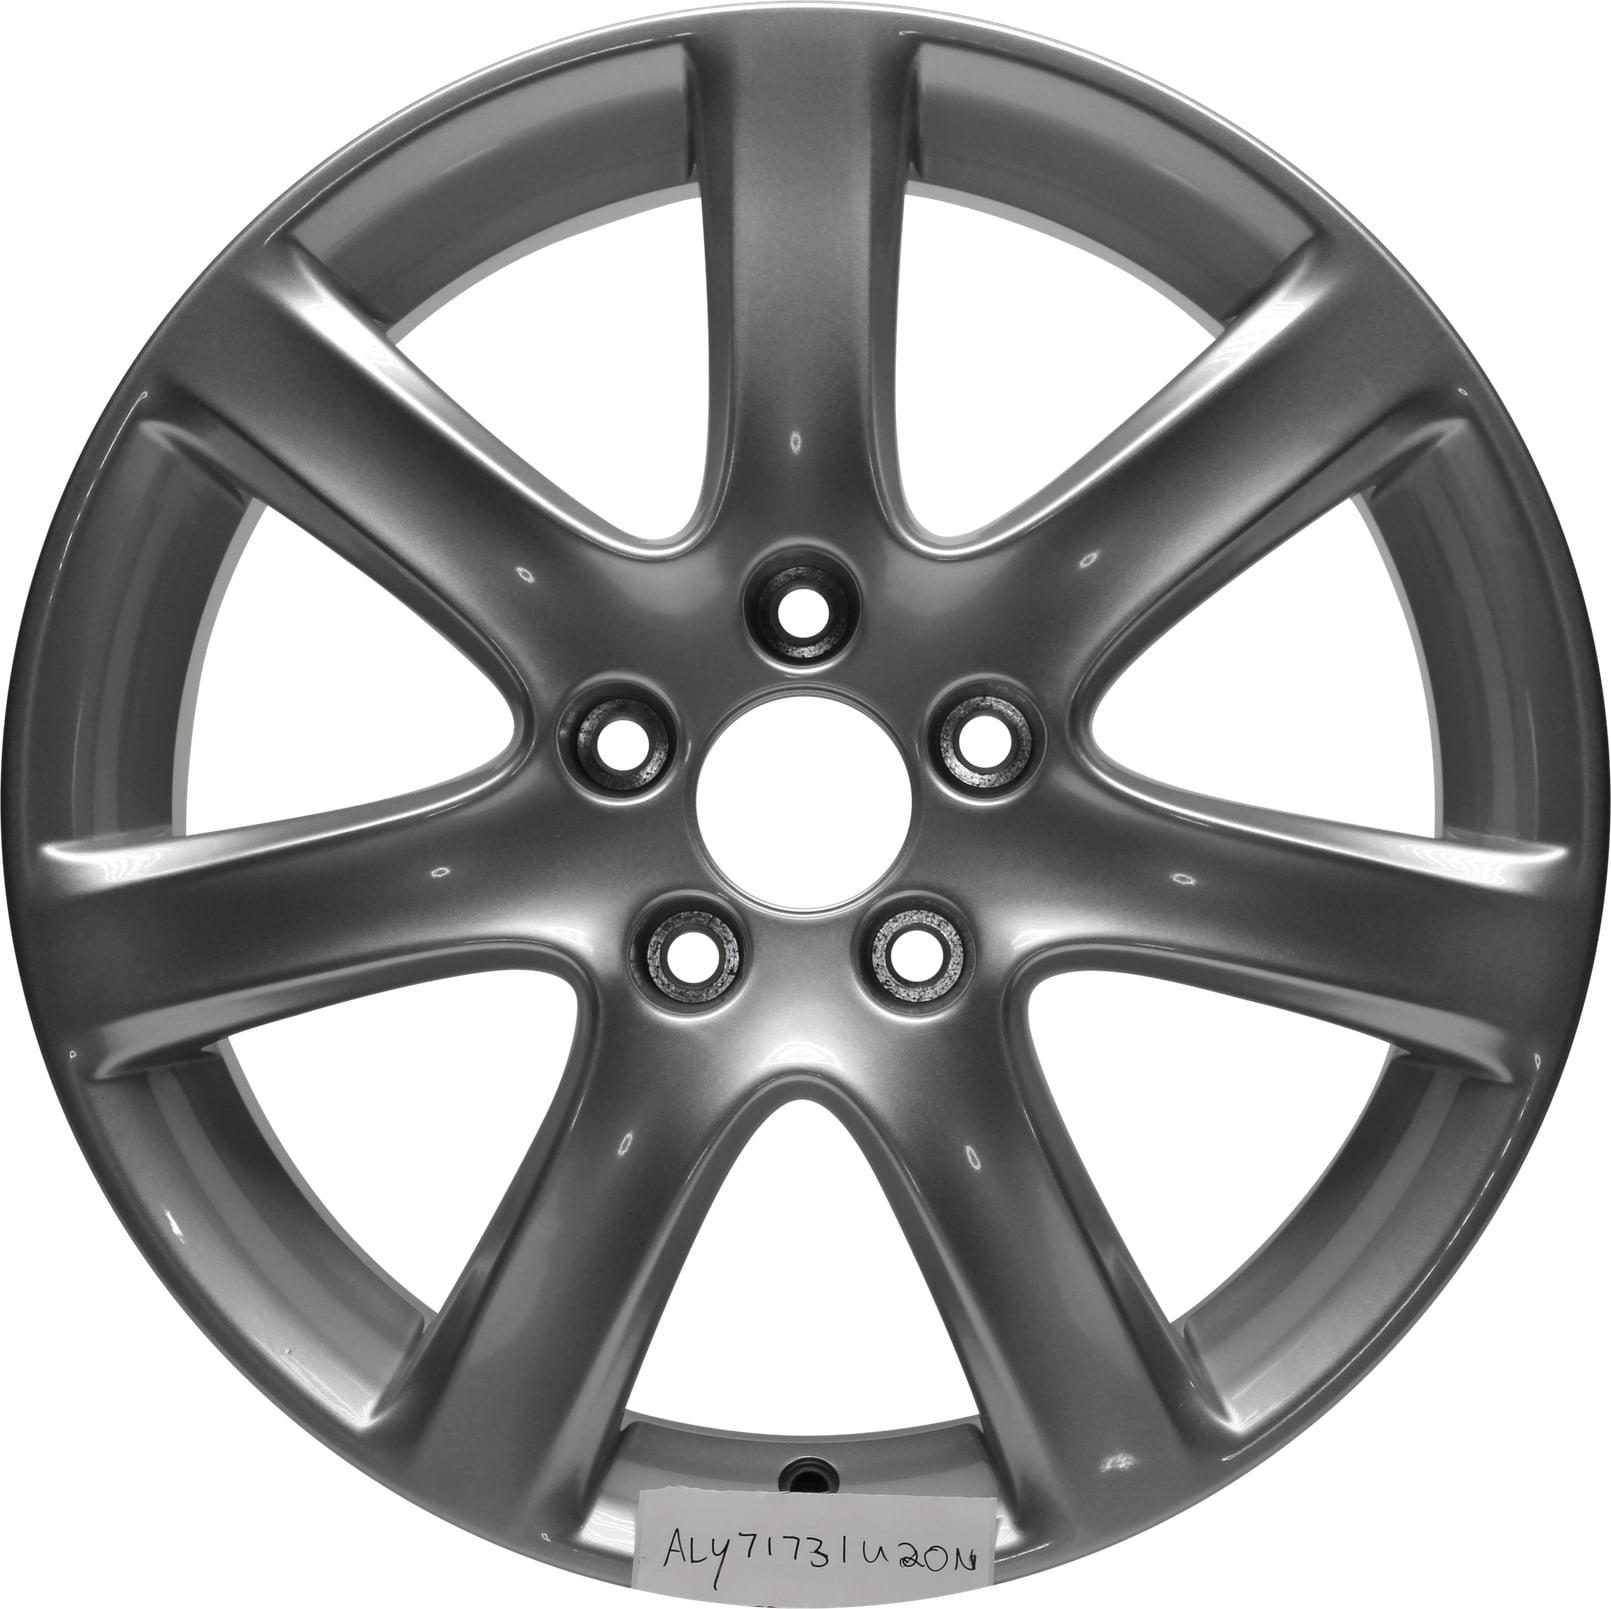 Aluminum Wheel Rim 17 Inch For Acura TSX 2004-2005 5 Lug